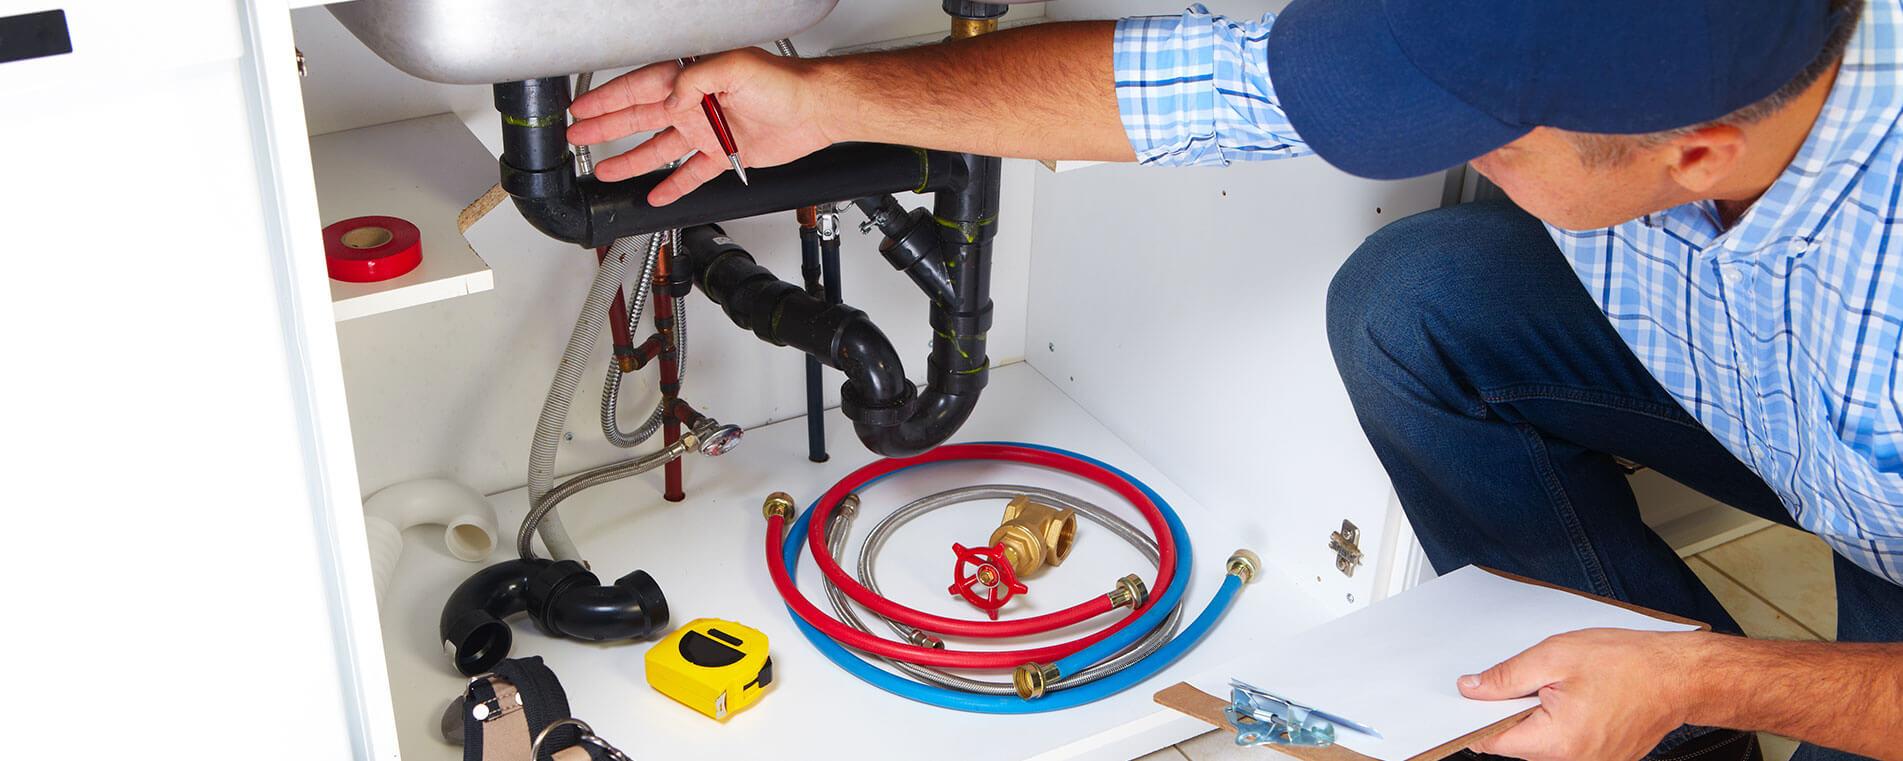 keilor-north Plumber fixing sink